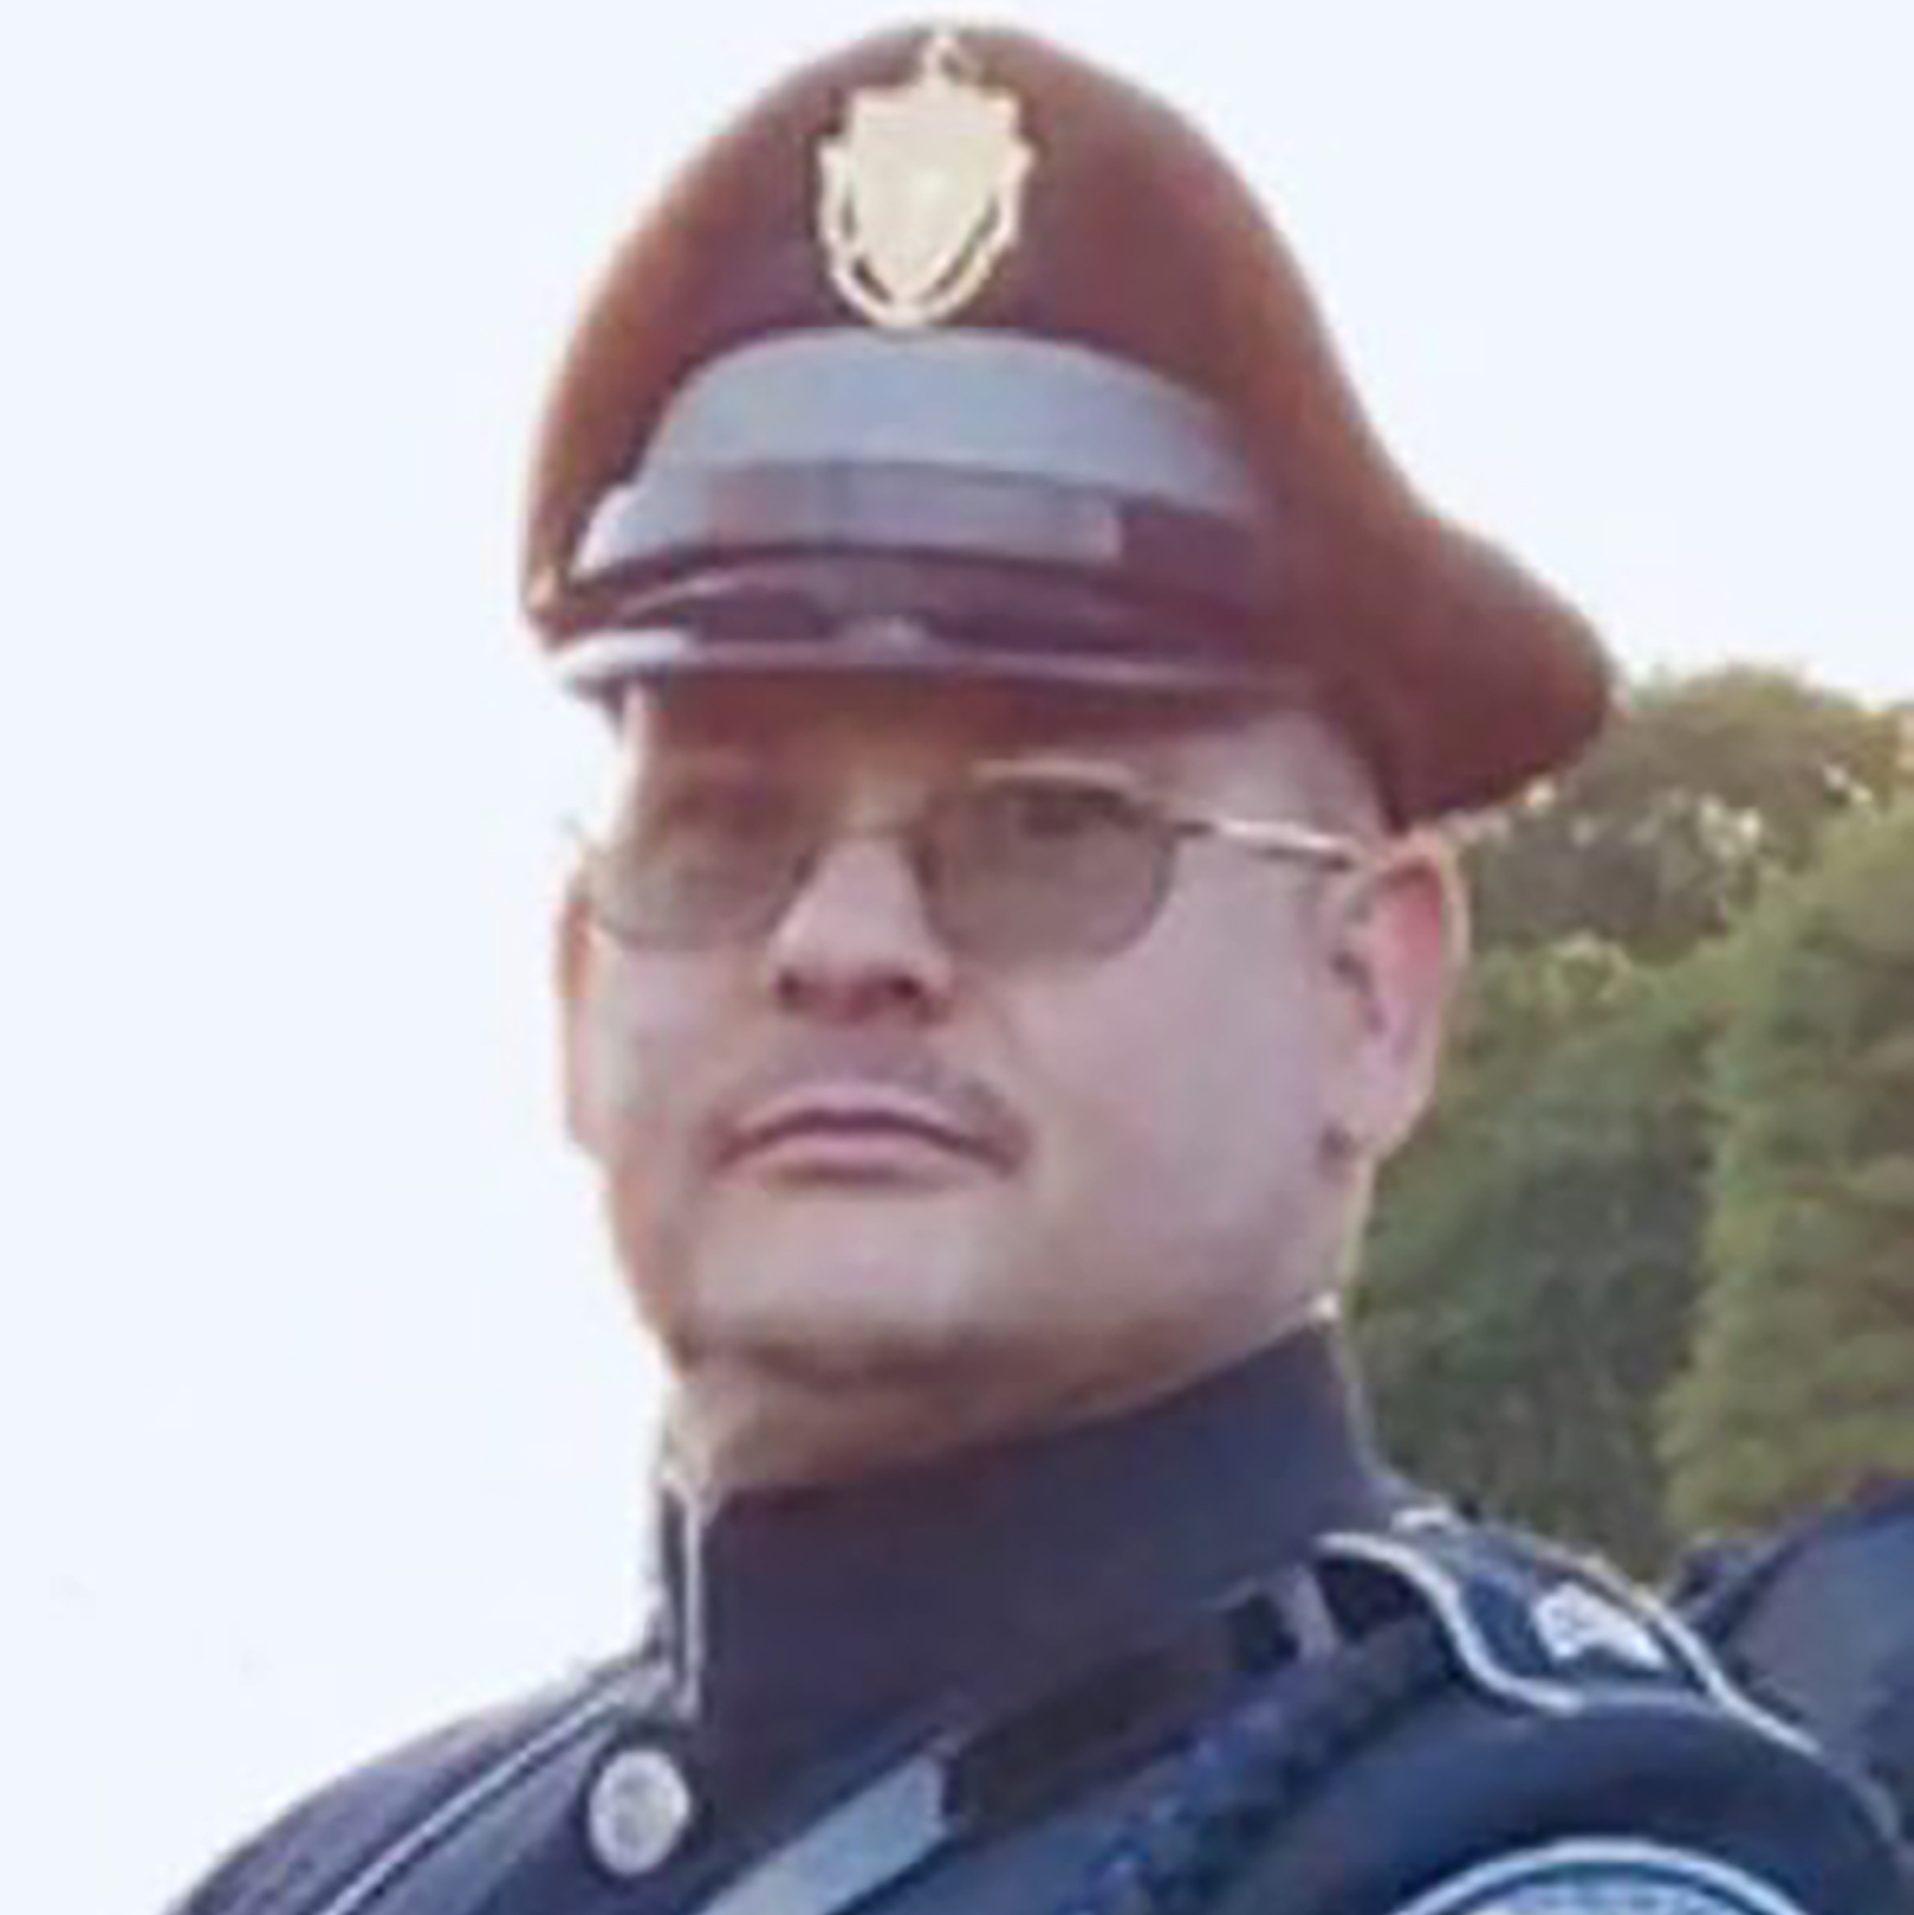 Sgt. Michael Cassidy.